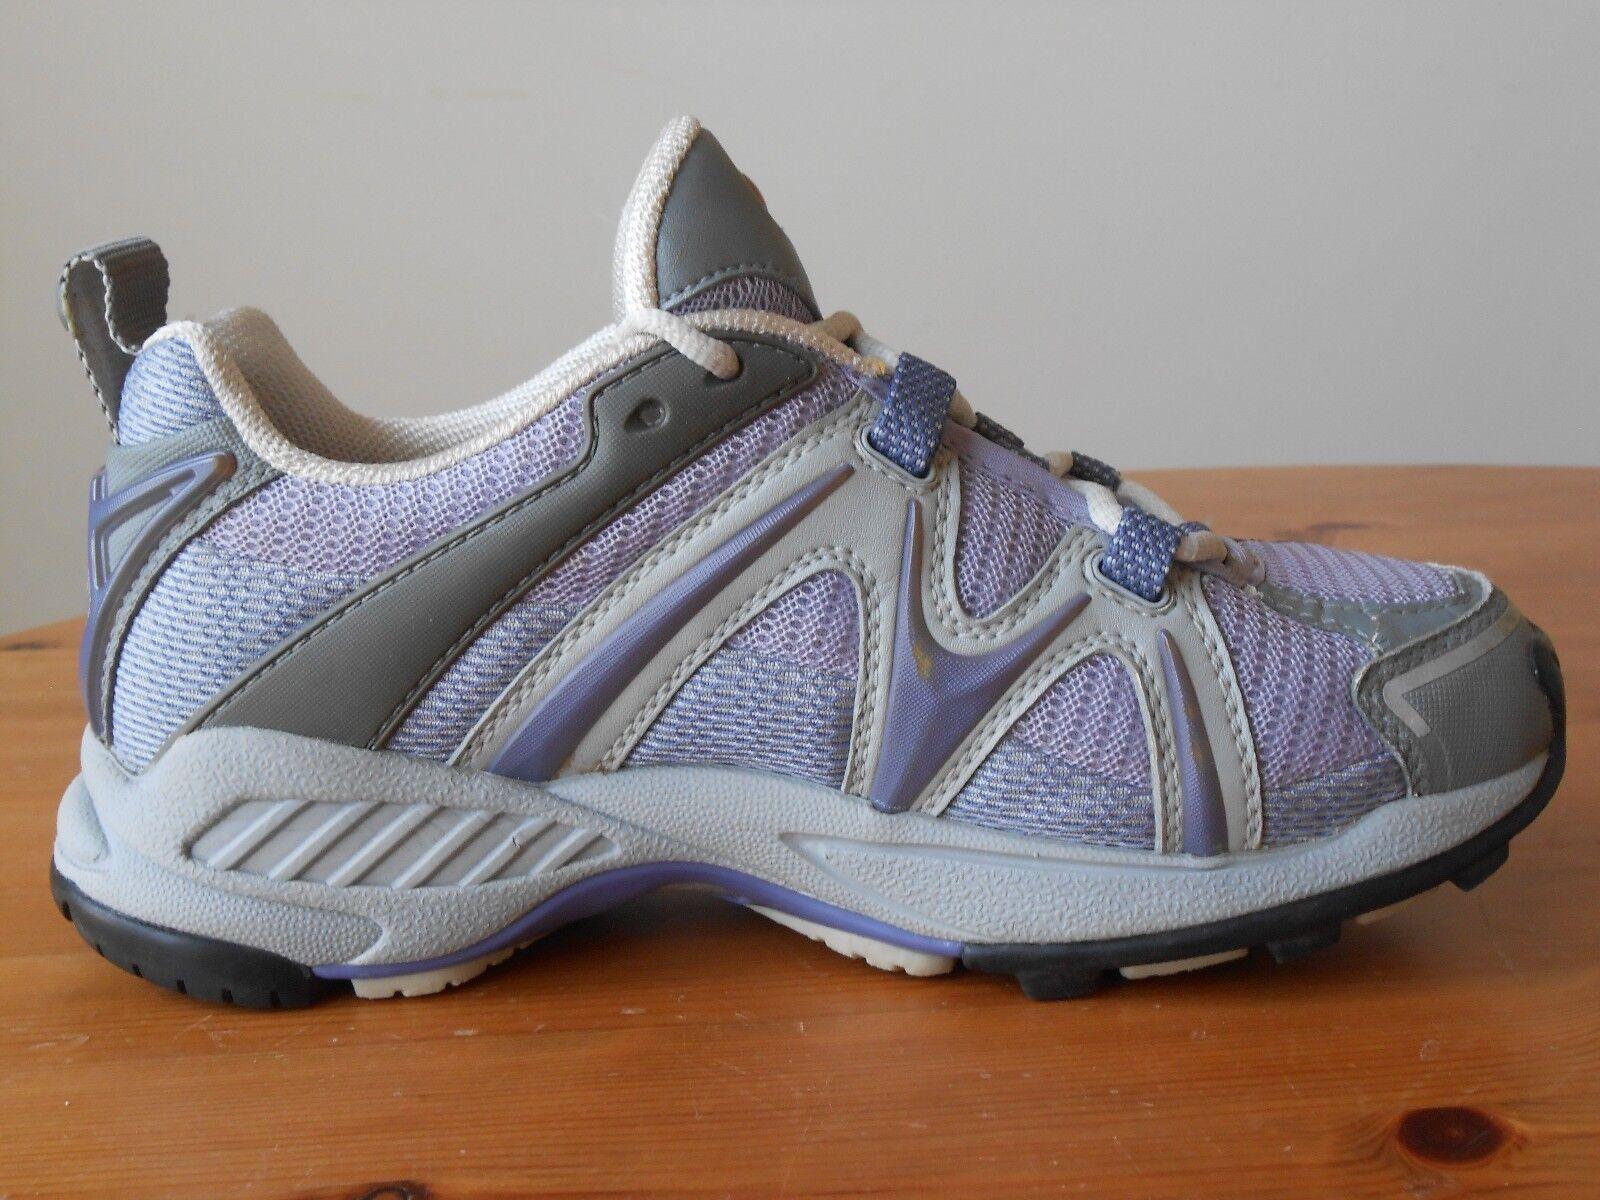 c5832549f540 Merrell Pursuit Sheild XCR Hiking shoes Gore Tex Continuum Women s Size 7  Vibram